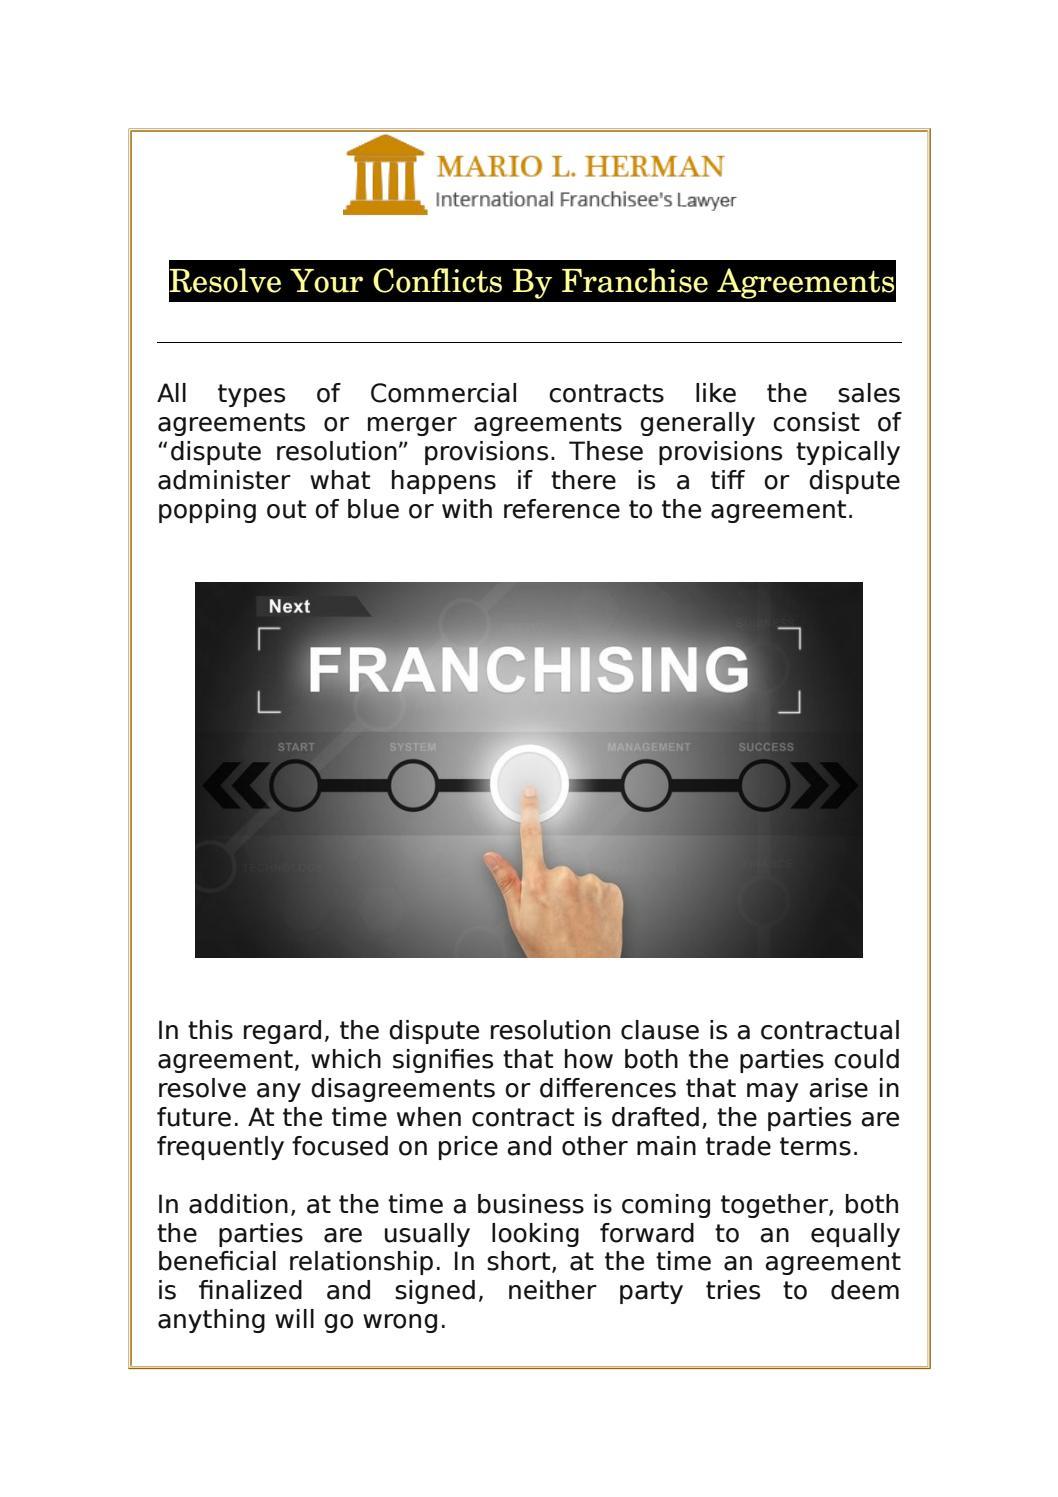 International Franchise Agreement Franchising Know How - mandegar.info